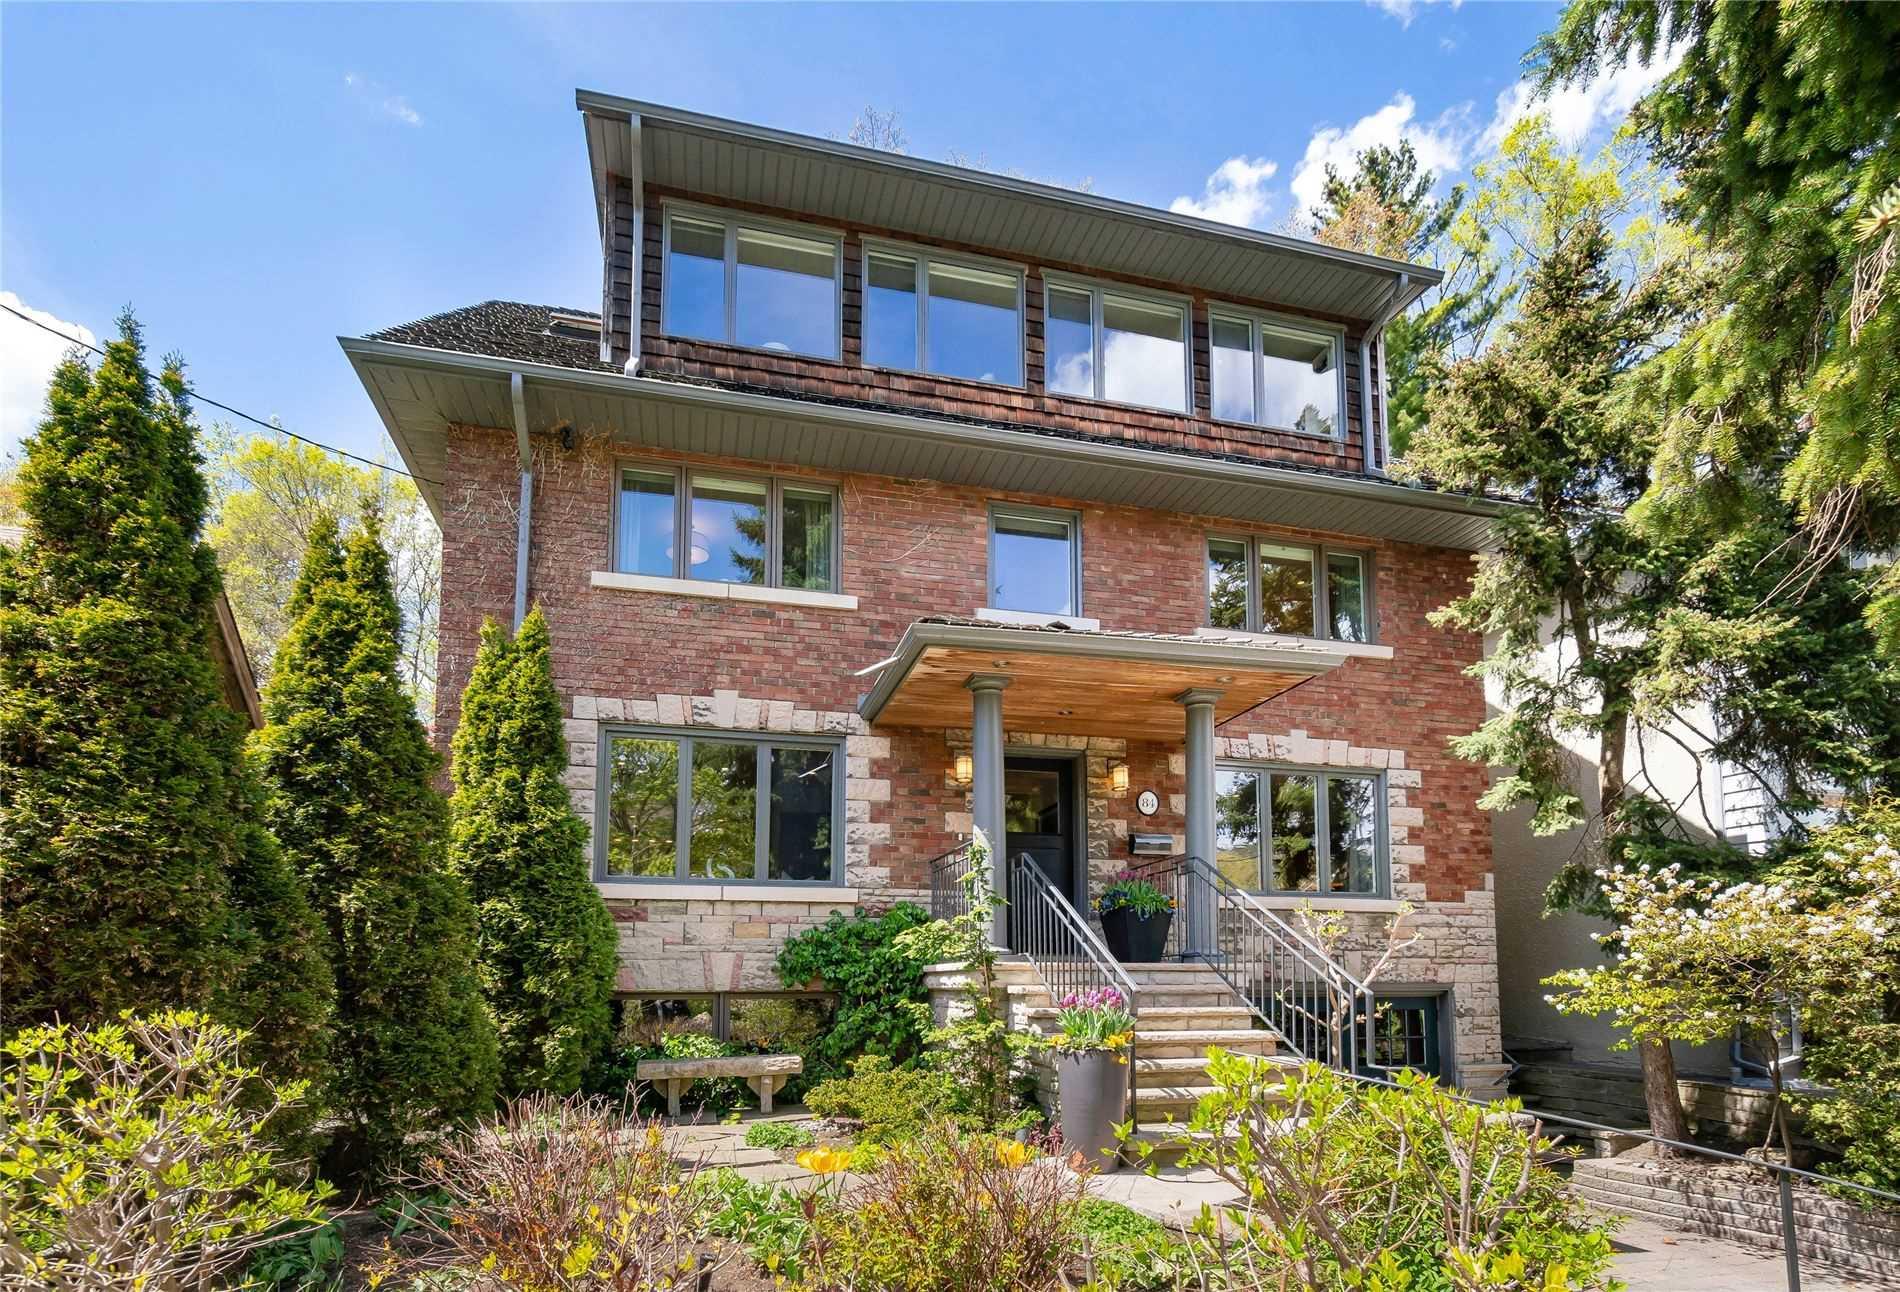 84 Ellis Park Rd, Toronto, Ontario M6S2V5, 4 Bedrooms Bedrooms, 8 Rooms Rooms,4 BathroomsBathrooms,Detached,For Sale,Ellis Park,W5231534